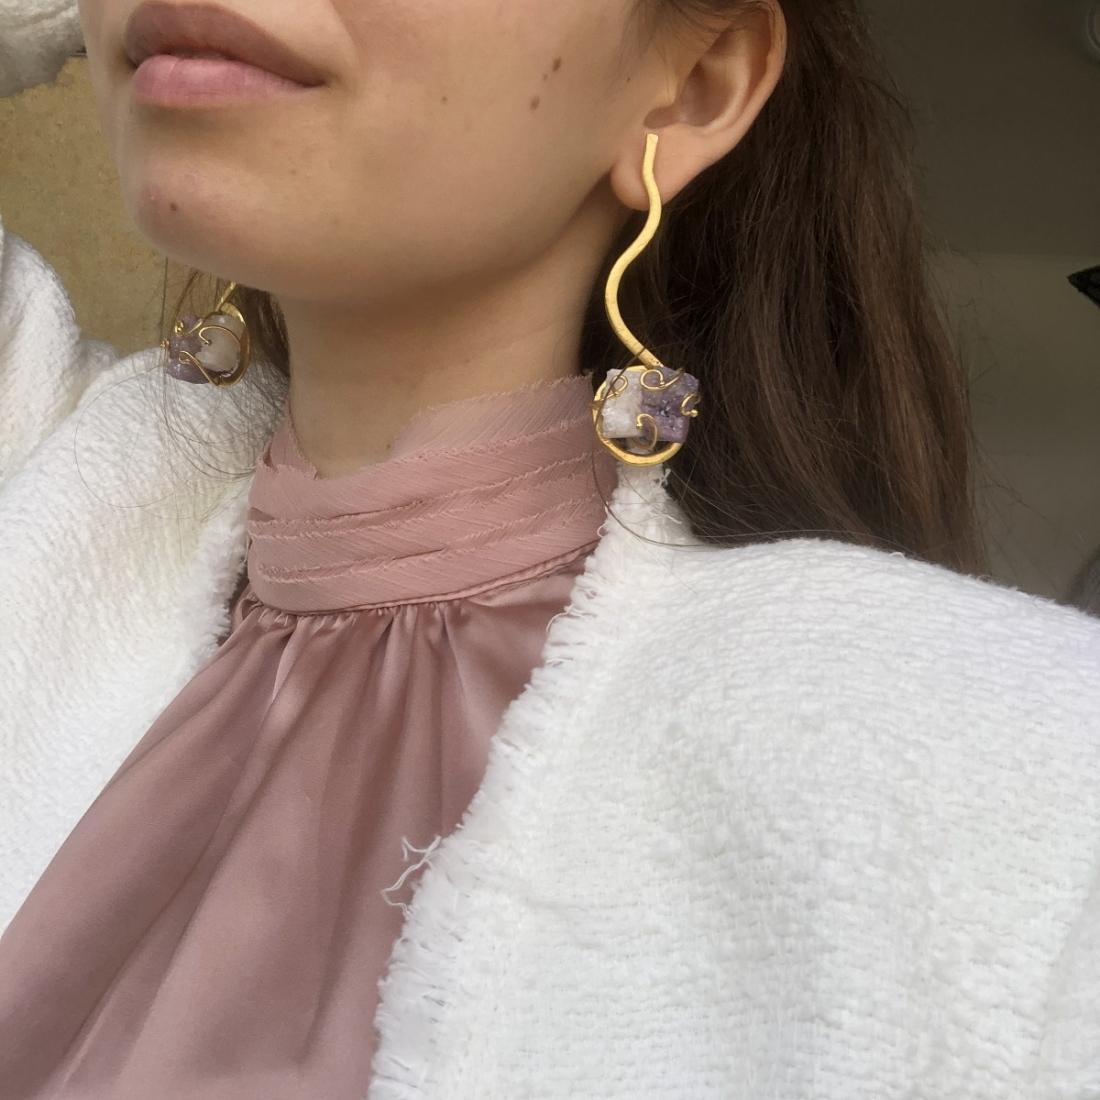 Candy Pop Mini's Gold-Plated Handmade Earrings